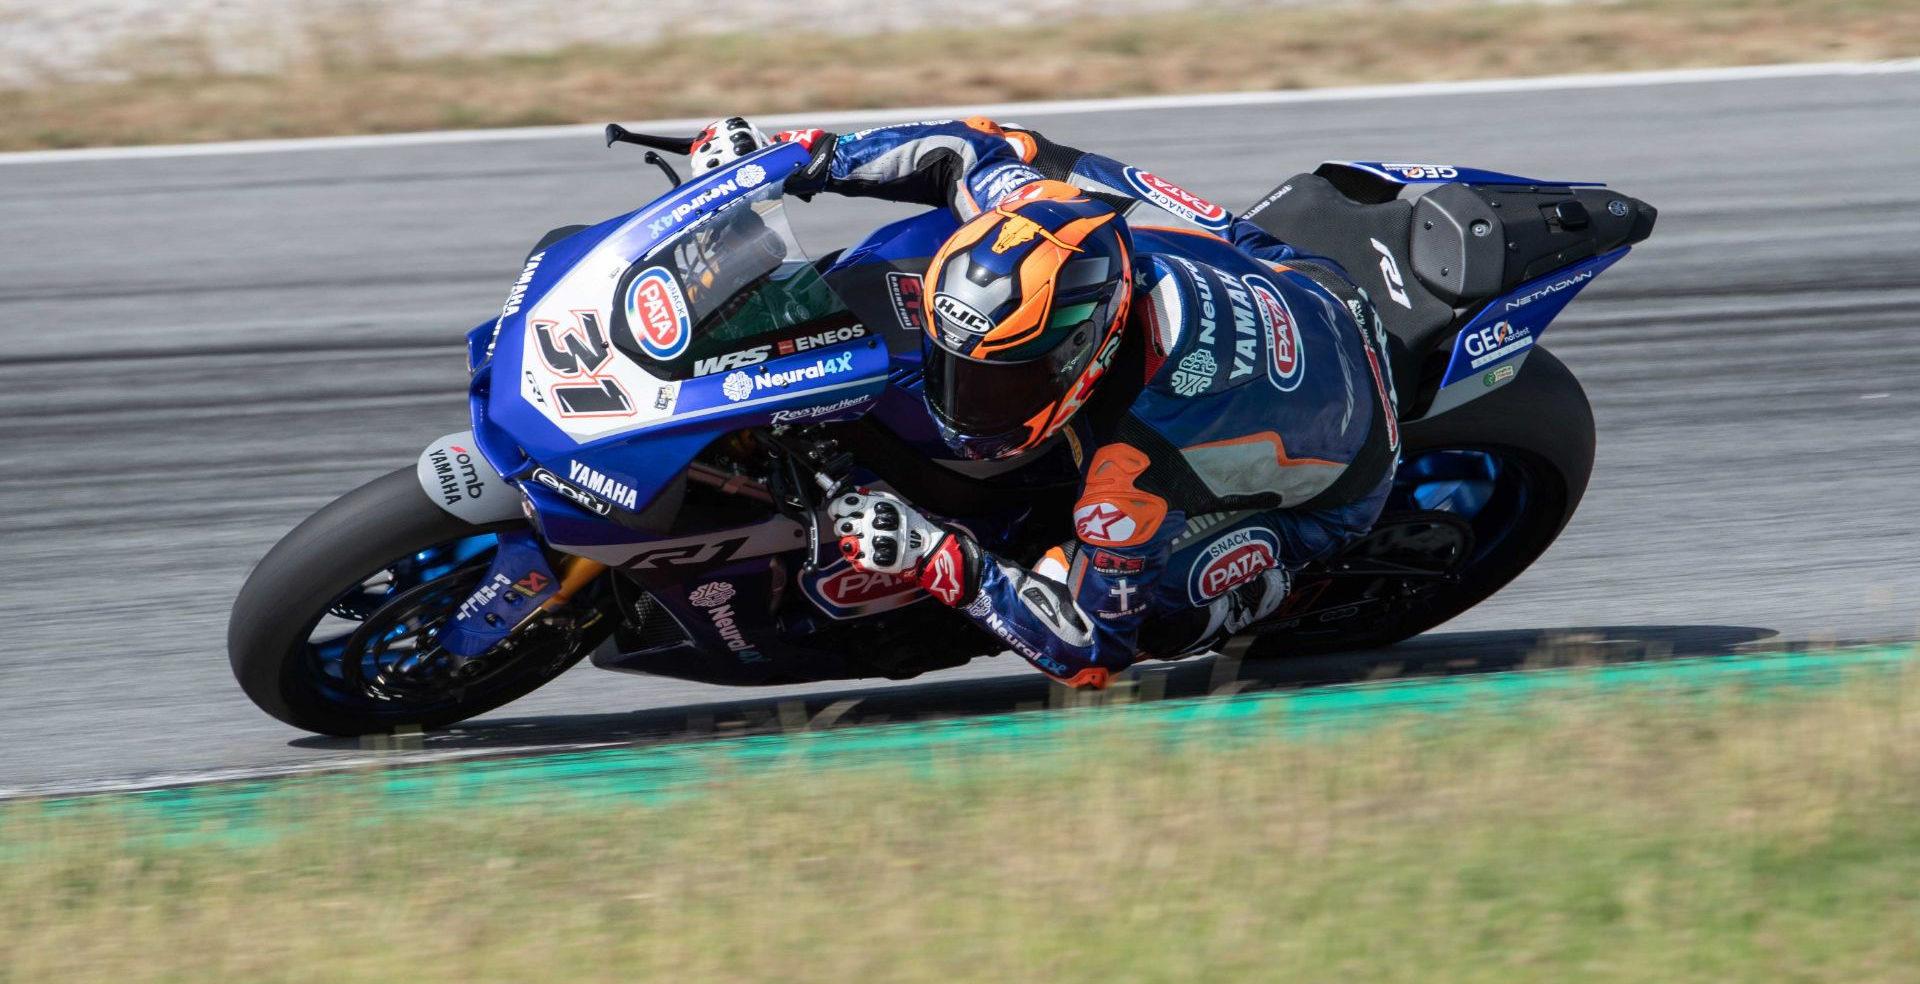 Garrett Gerloff (31), as seen during testing at the Catalunya Circuit. Photo courtesy Yamaha.